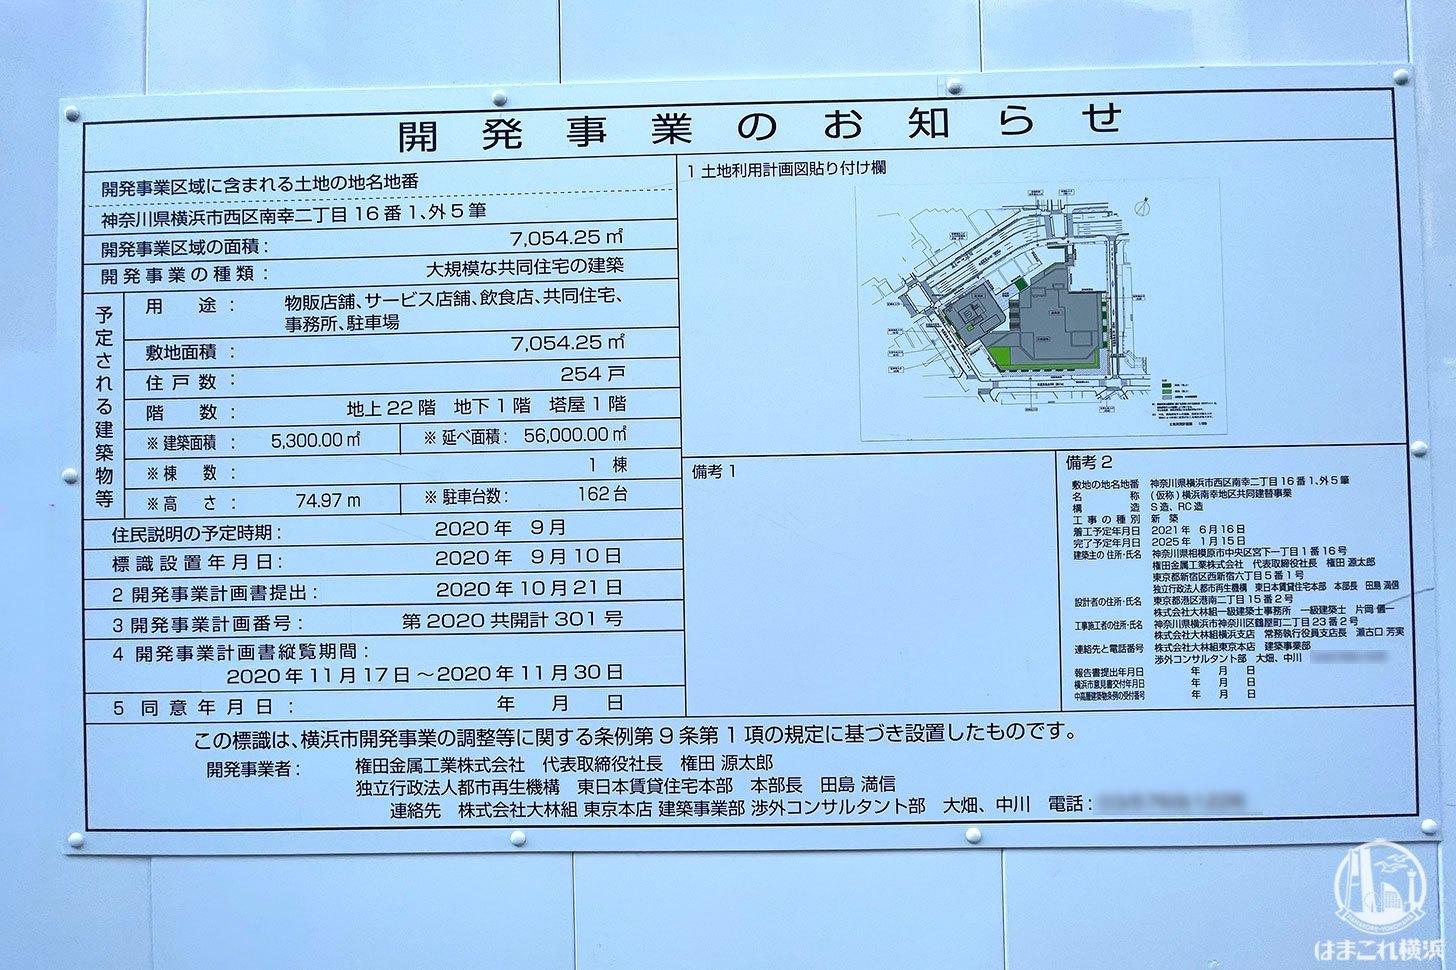 横浜駅西口ダイエー 計画概要